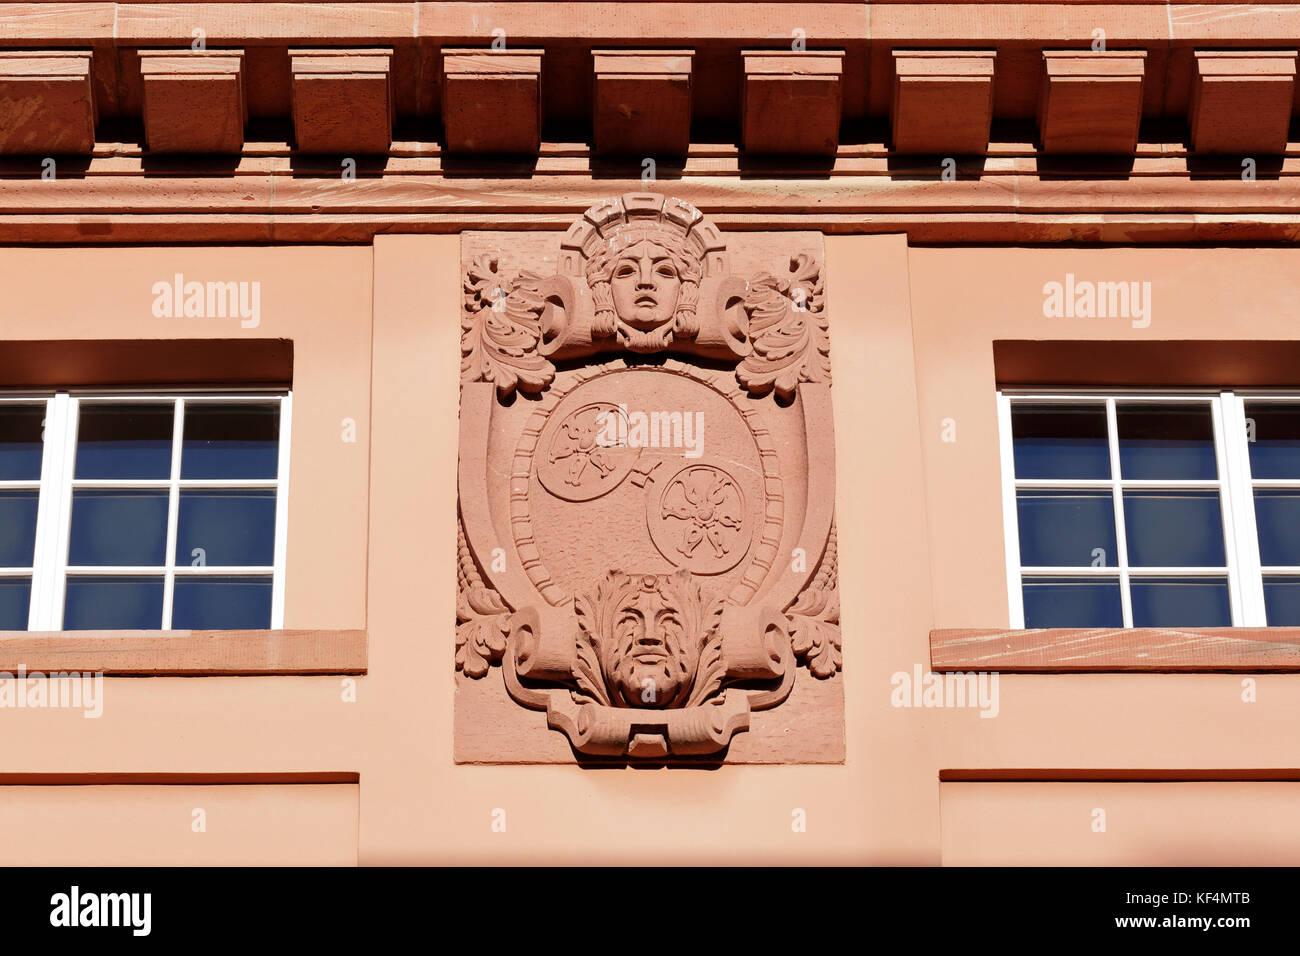 Staatstheater in Mainz, Rheinland-Pfalz, Grosses Haus, Kartusche an der Fassade, Schmuckkartusche, allegorische - Stock Image